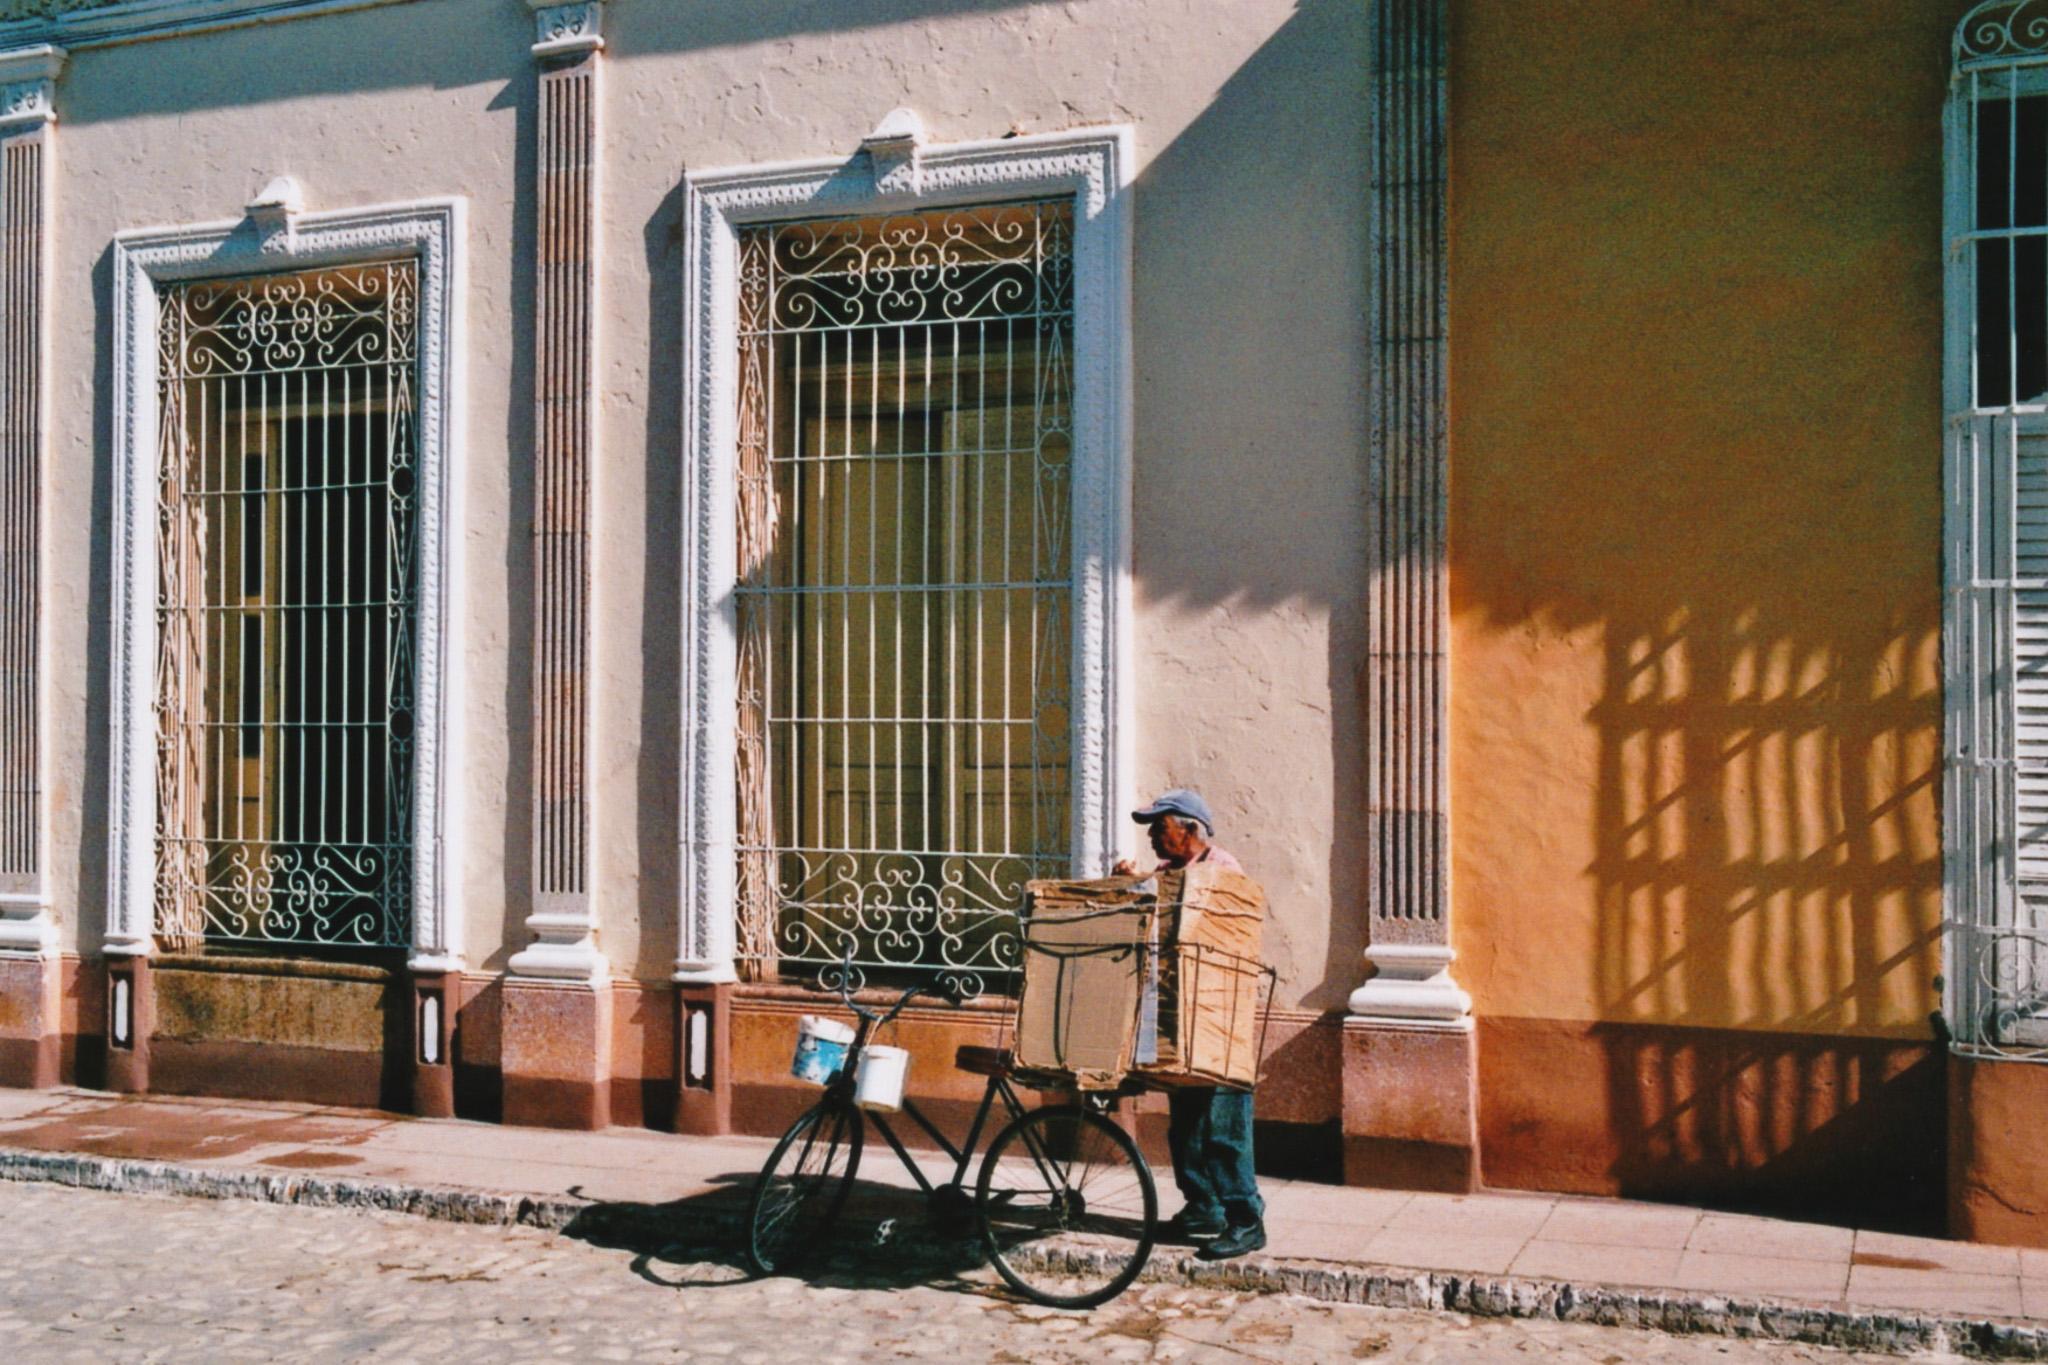 Kuba-2017-12-Analog-096.jpg